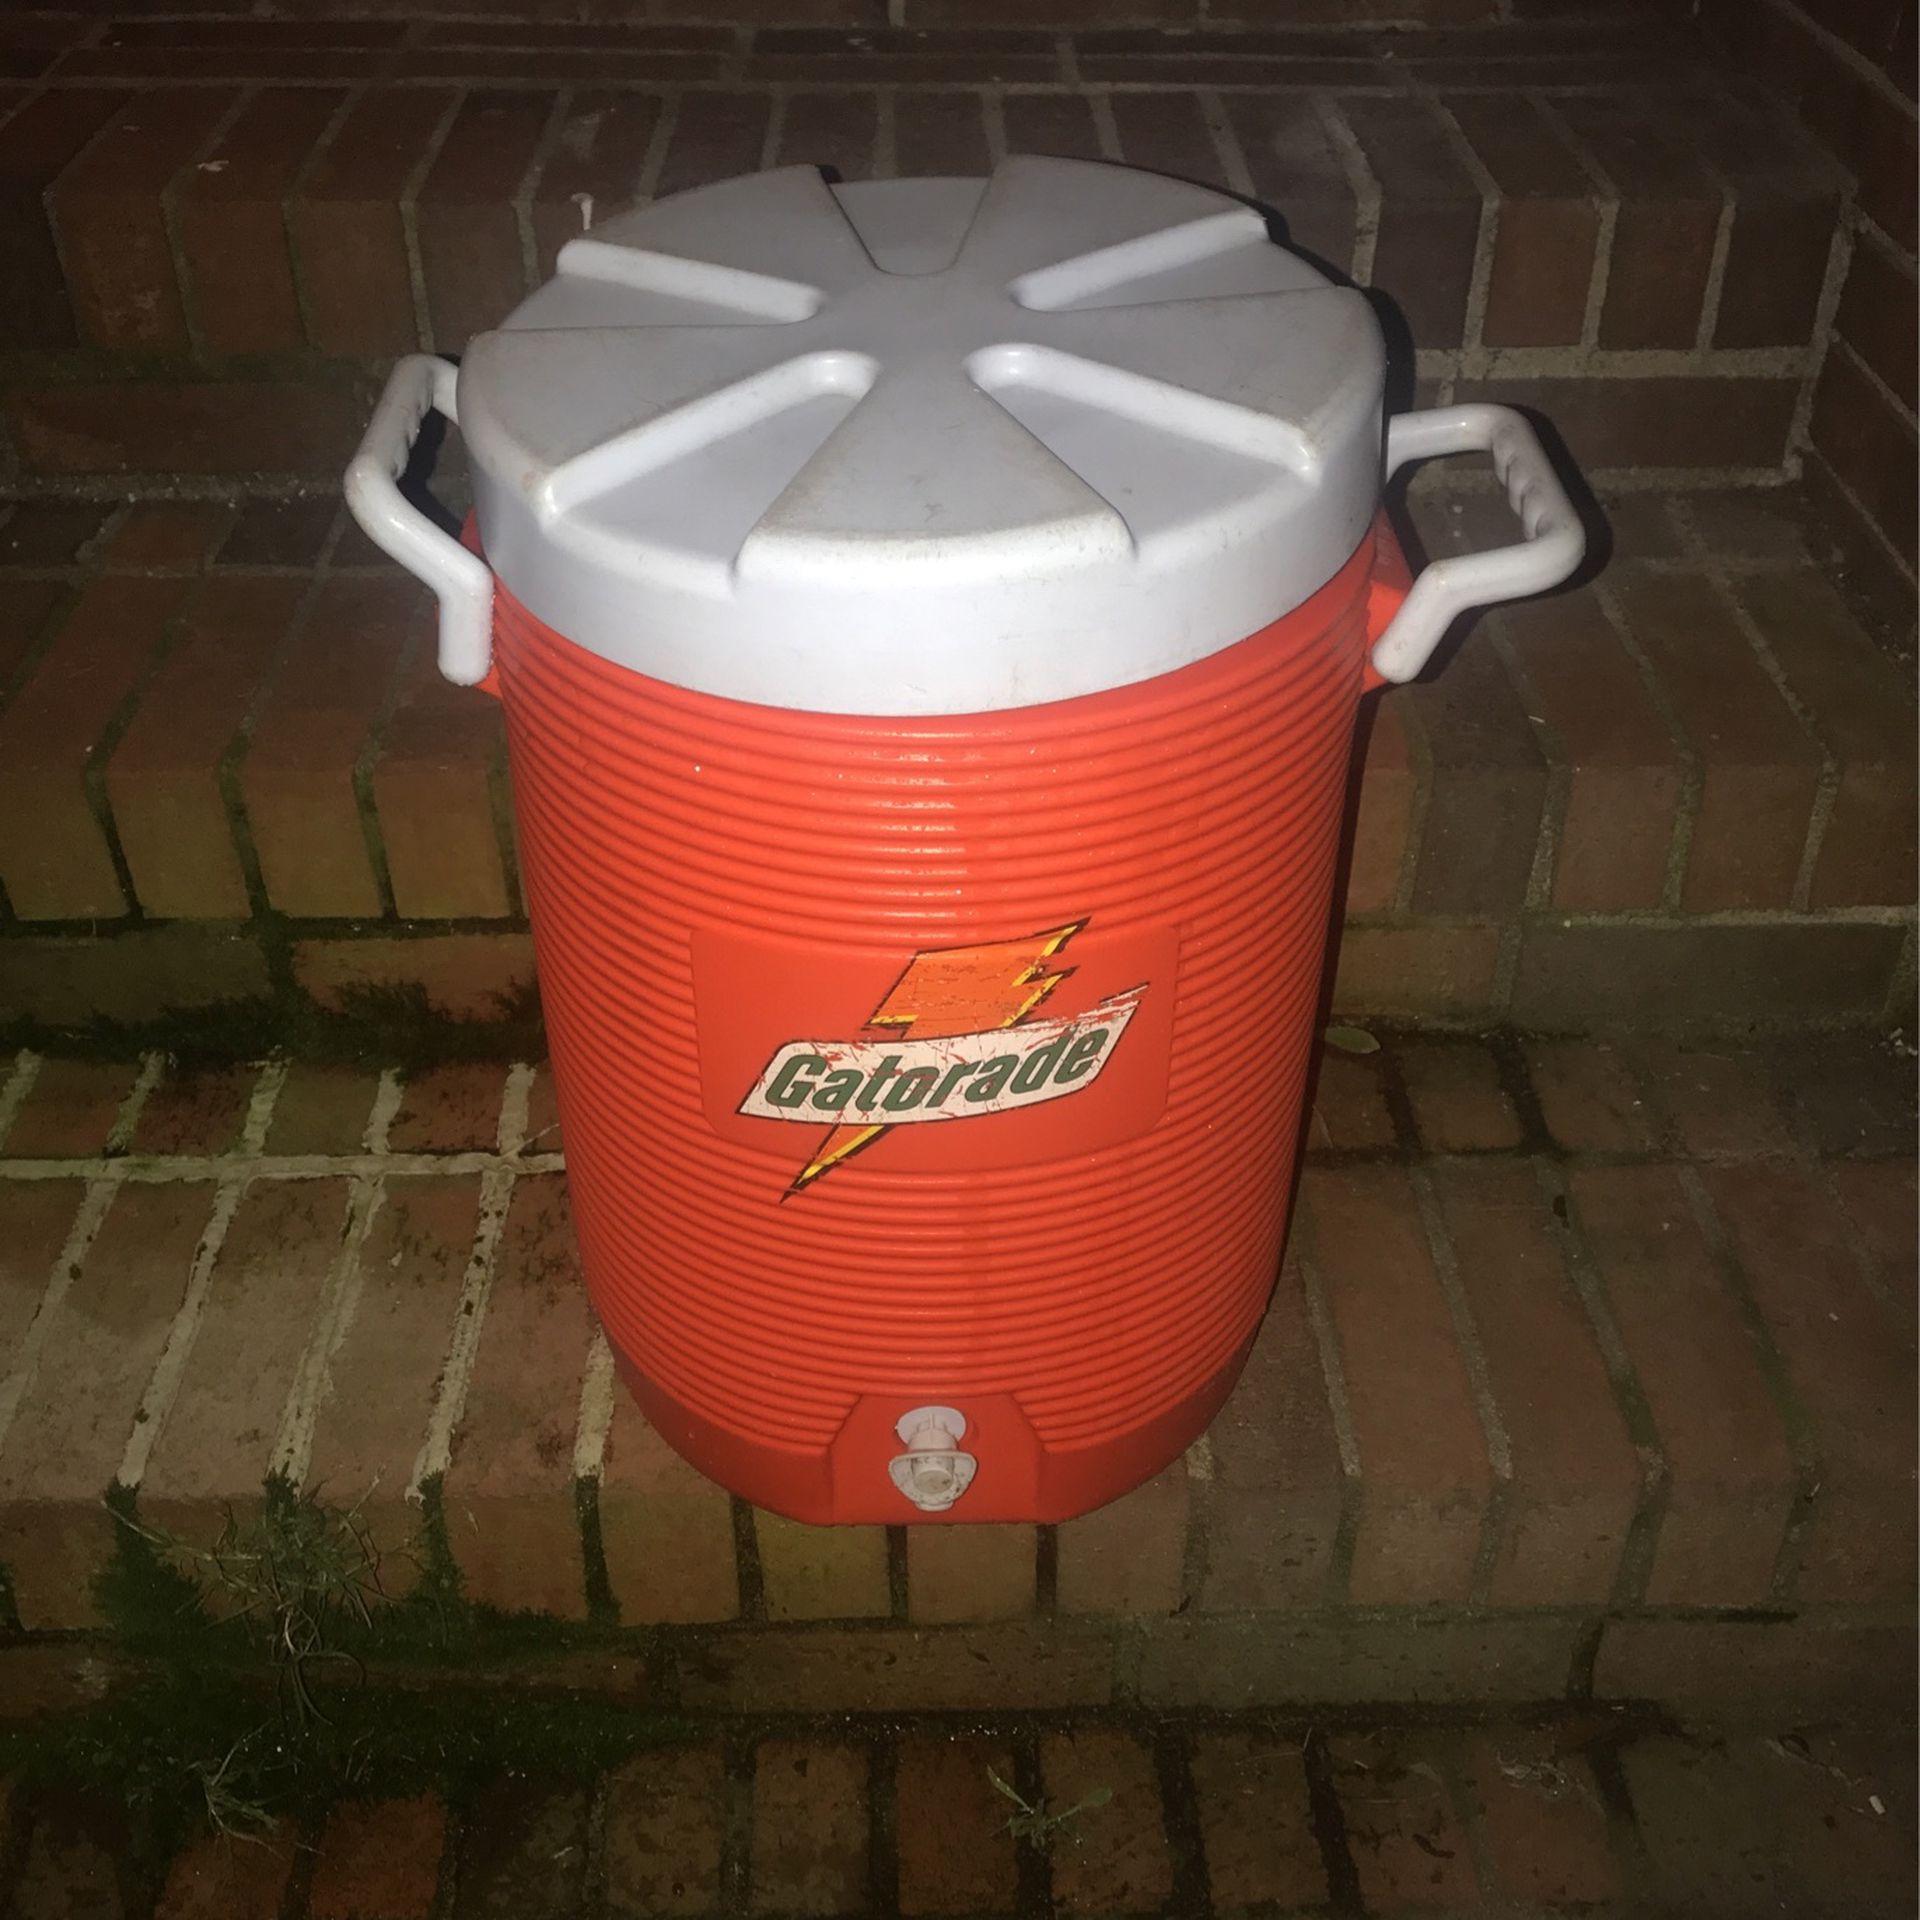 Gatorade 10 Gallon Dispenser - Cooler